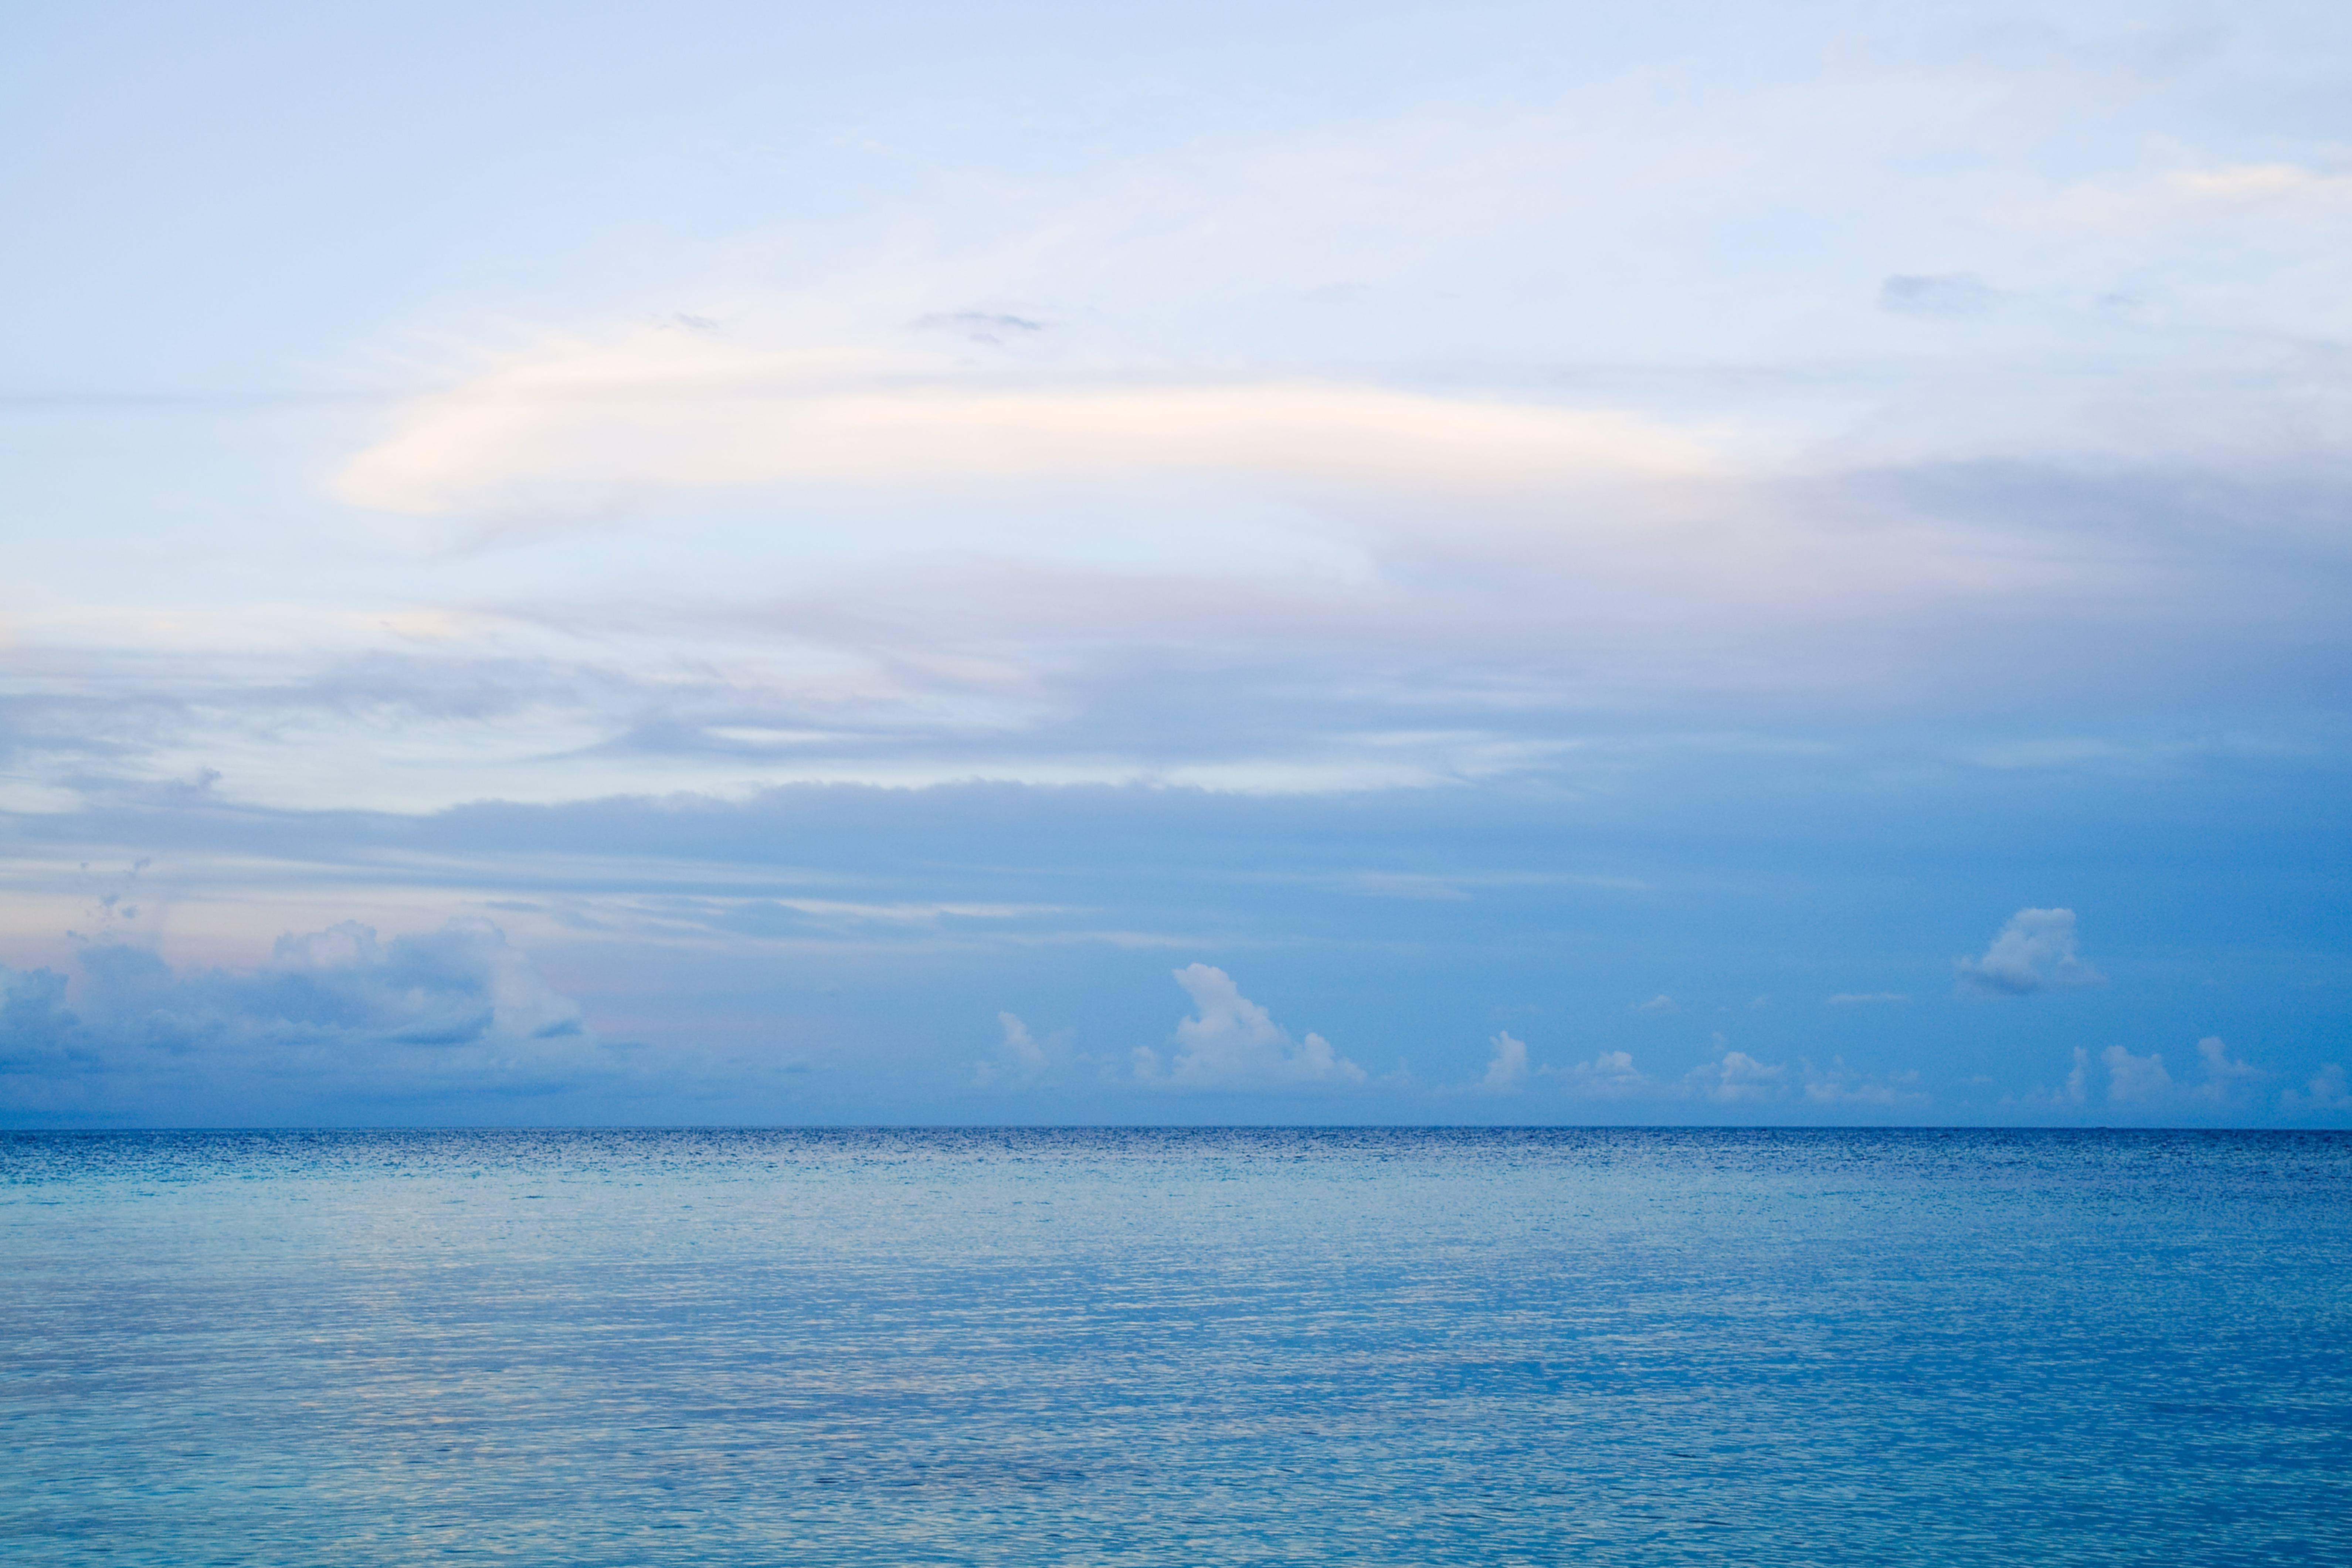 Blue sky at sea